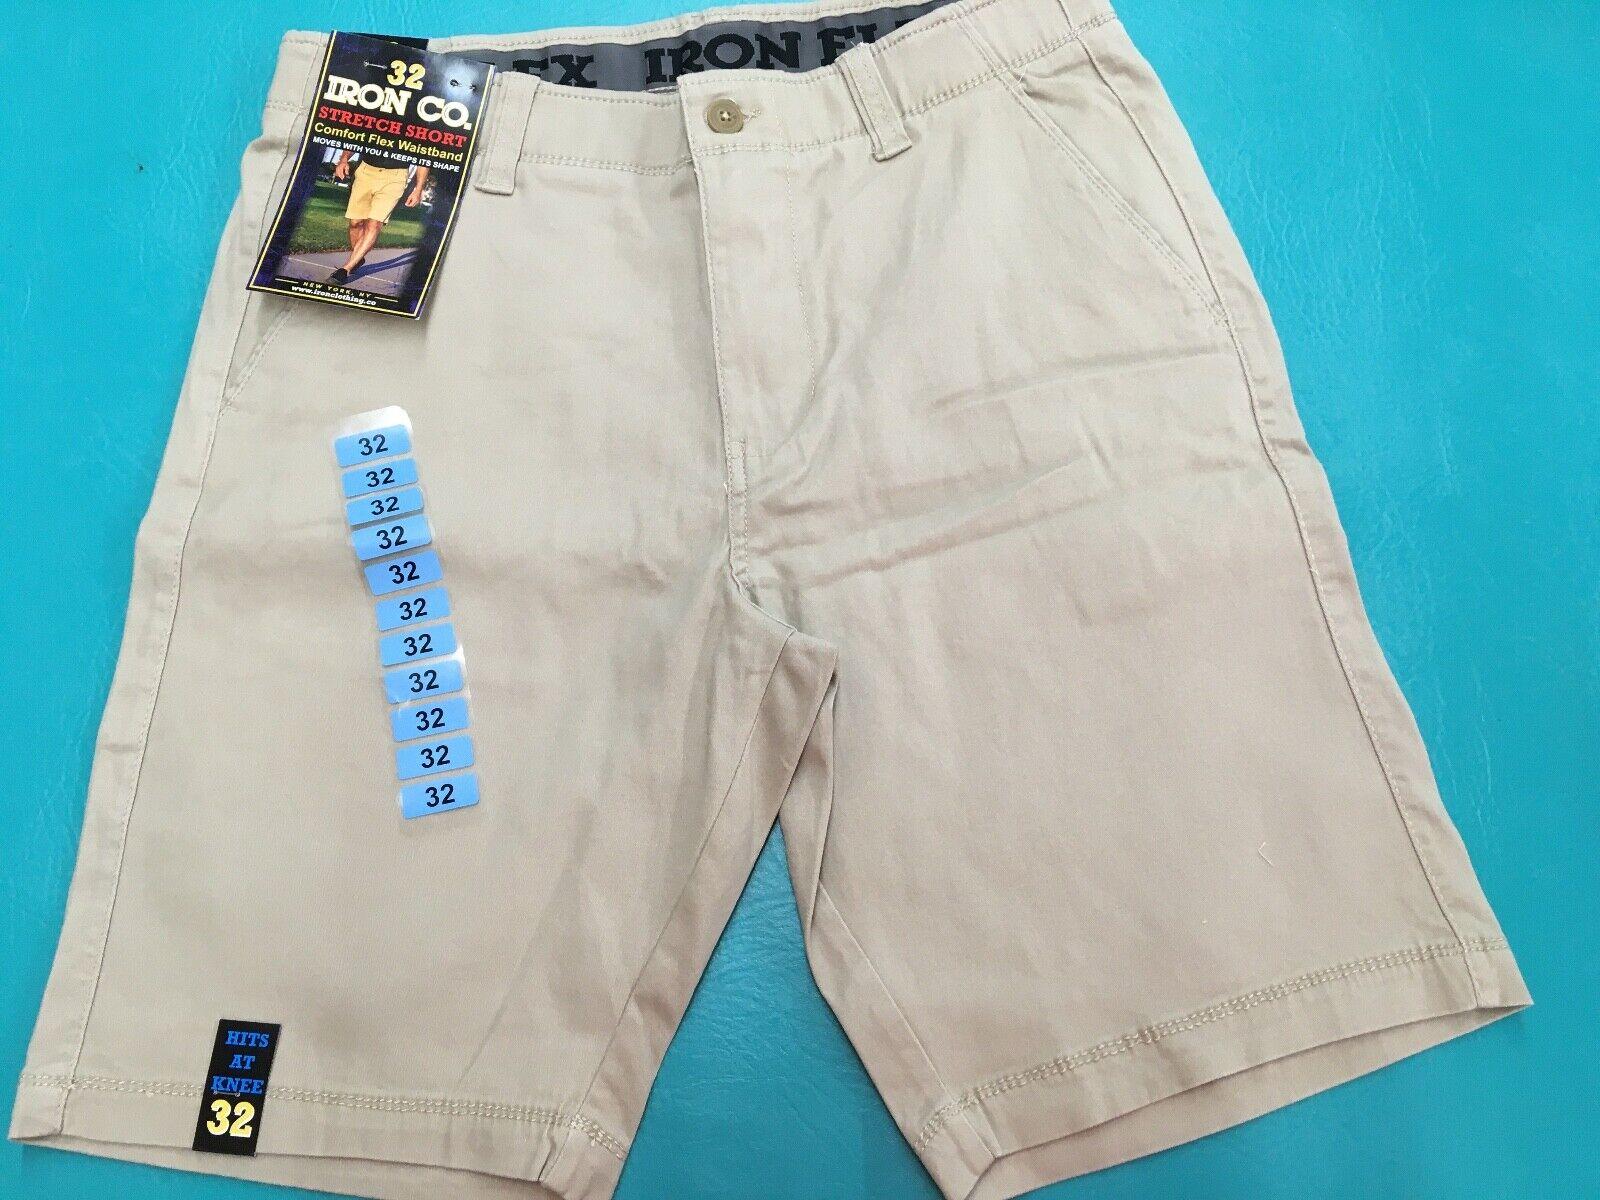 Comfort Flex Waistband Stretch Mens Shorts Pants Cotton Spandex NEW Iron Co